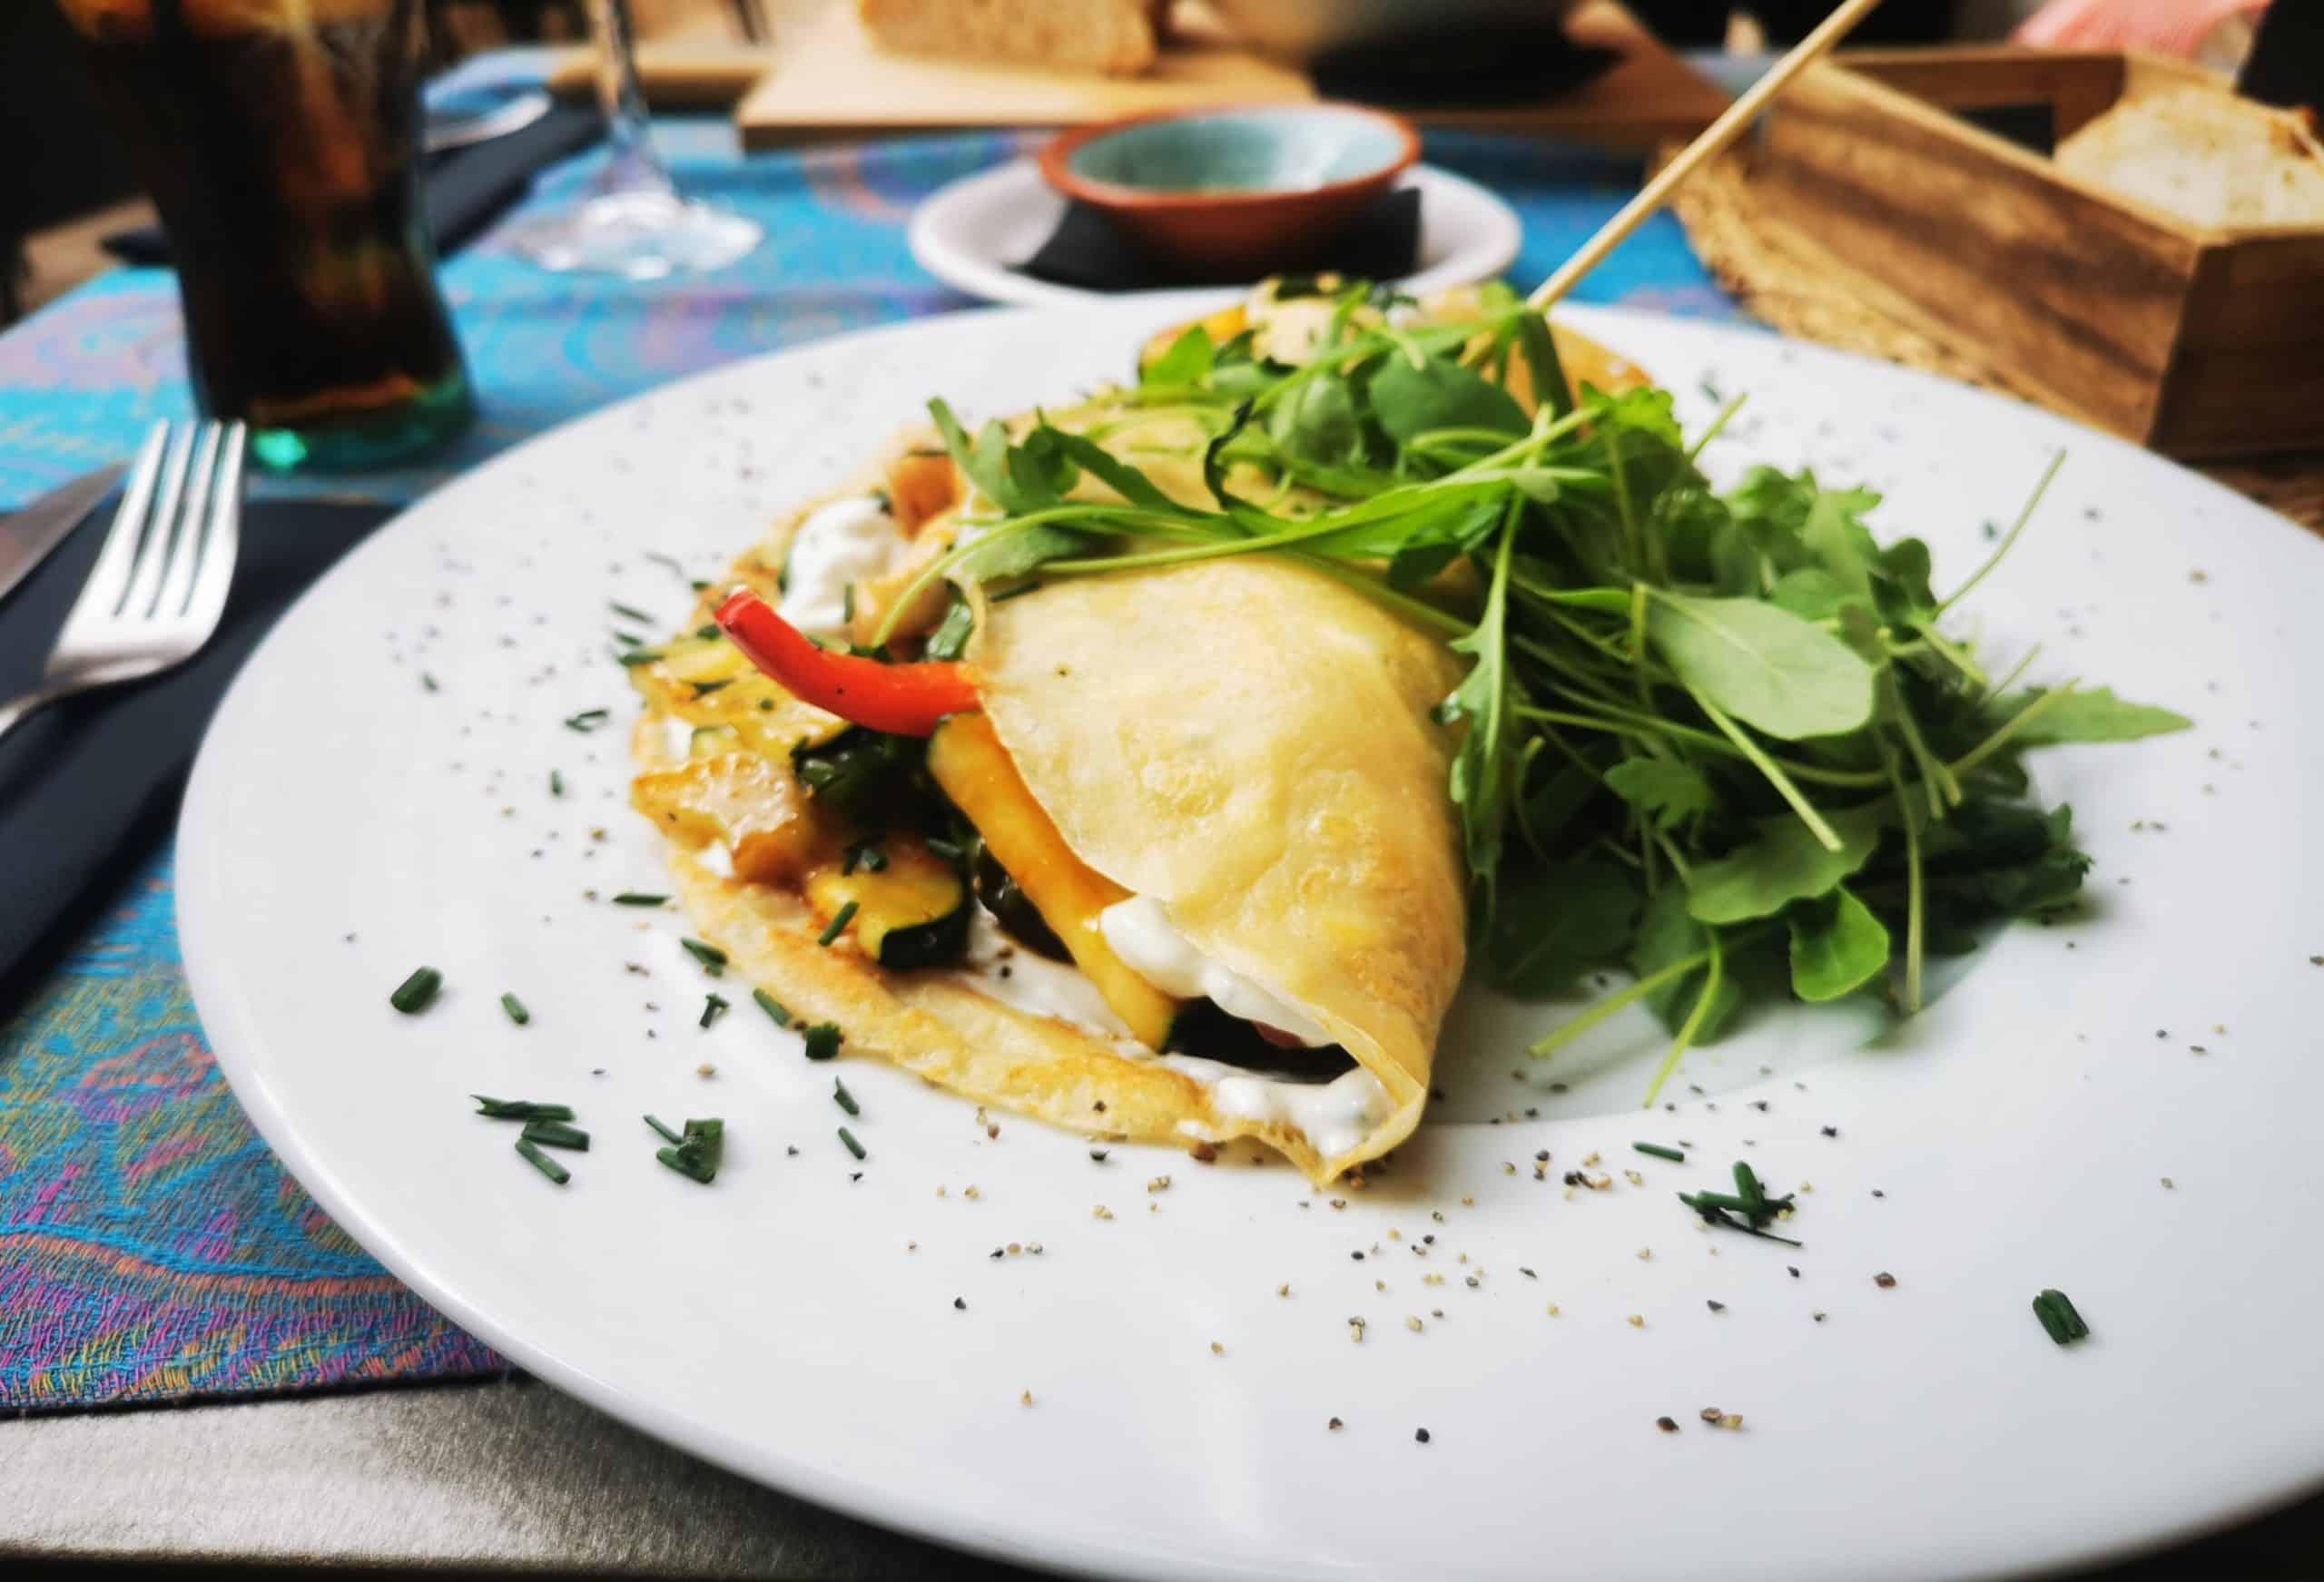 ntanyi_Restaurant Goli_Essen_Crepe